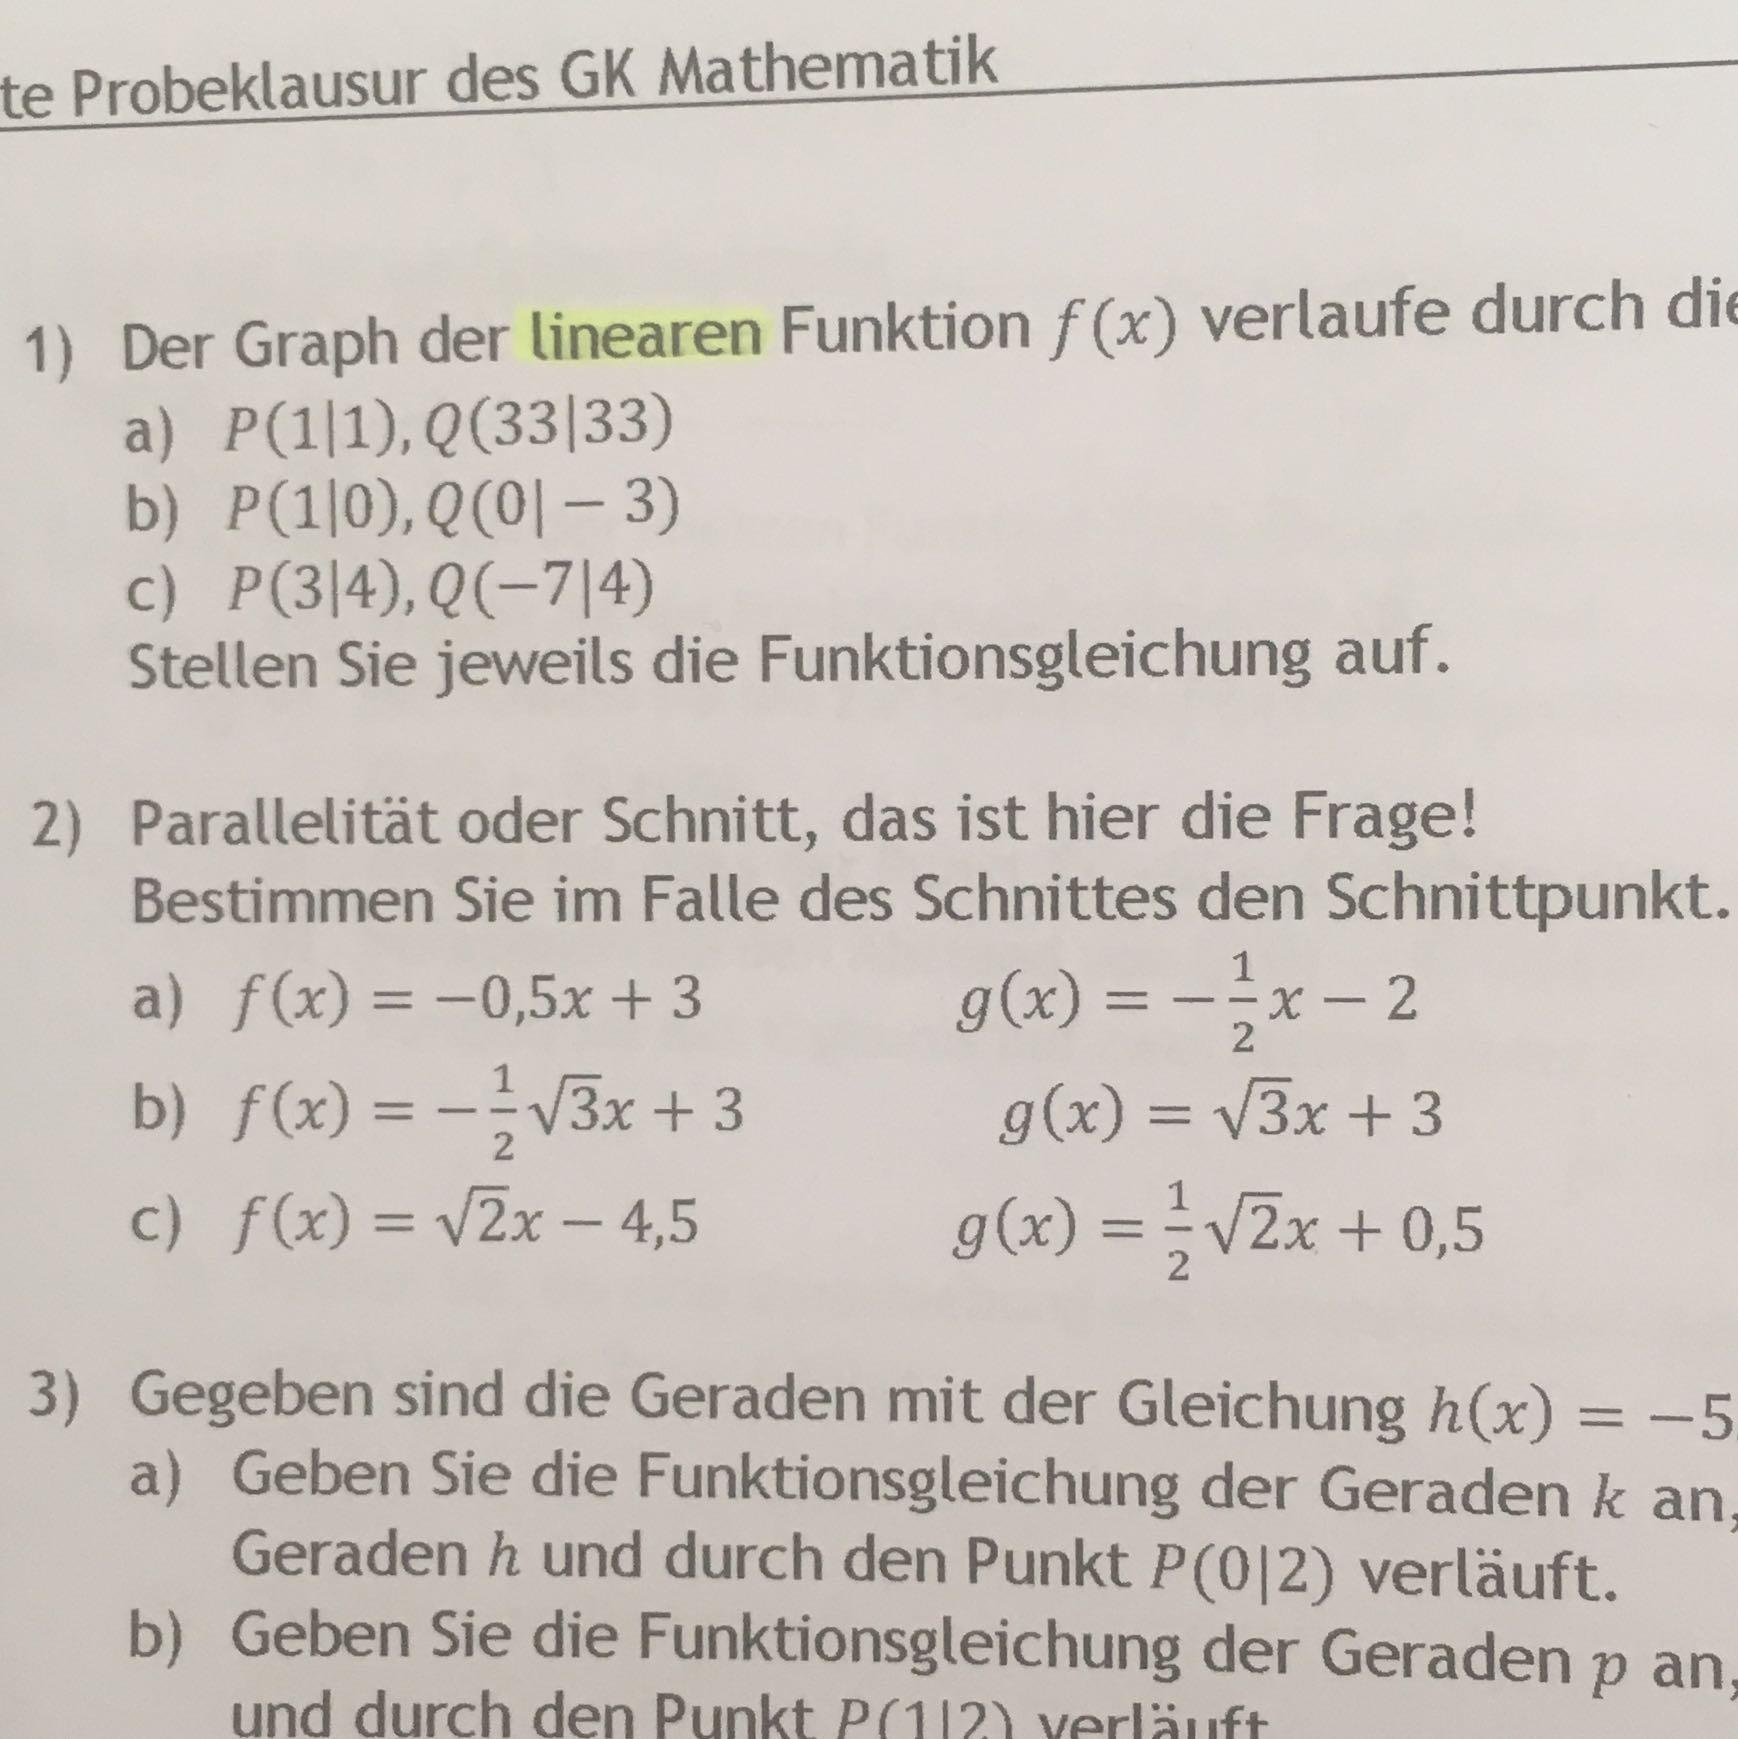 Tolle Quadratwurzel Vereinfachung Arbeitsblatt Fotos - Super Lehrer ...